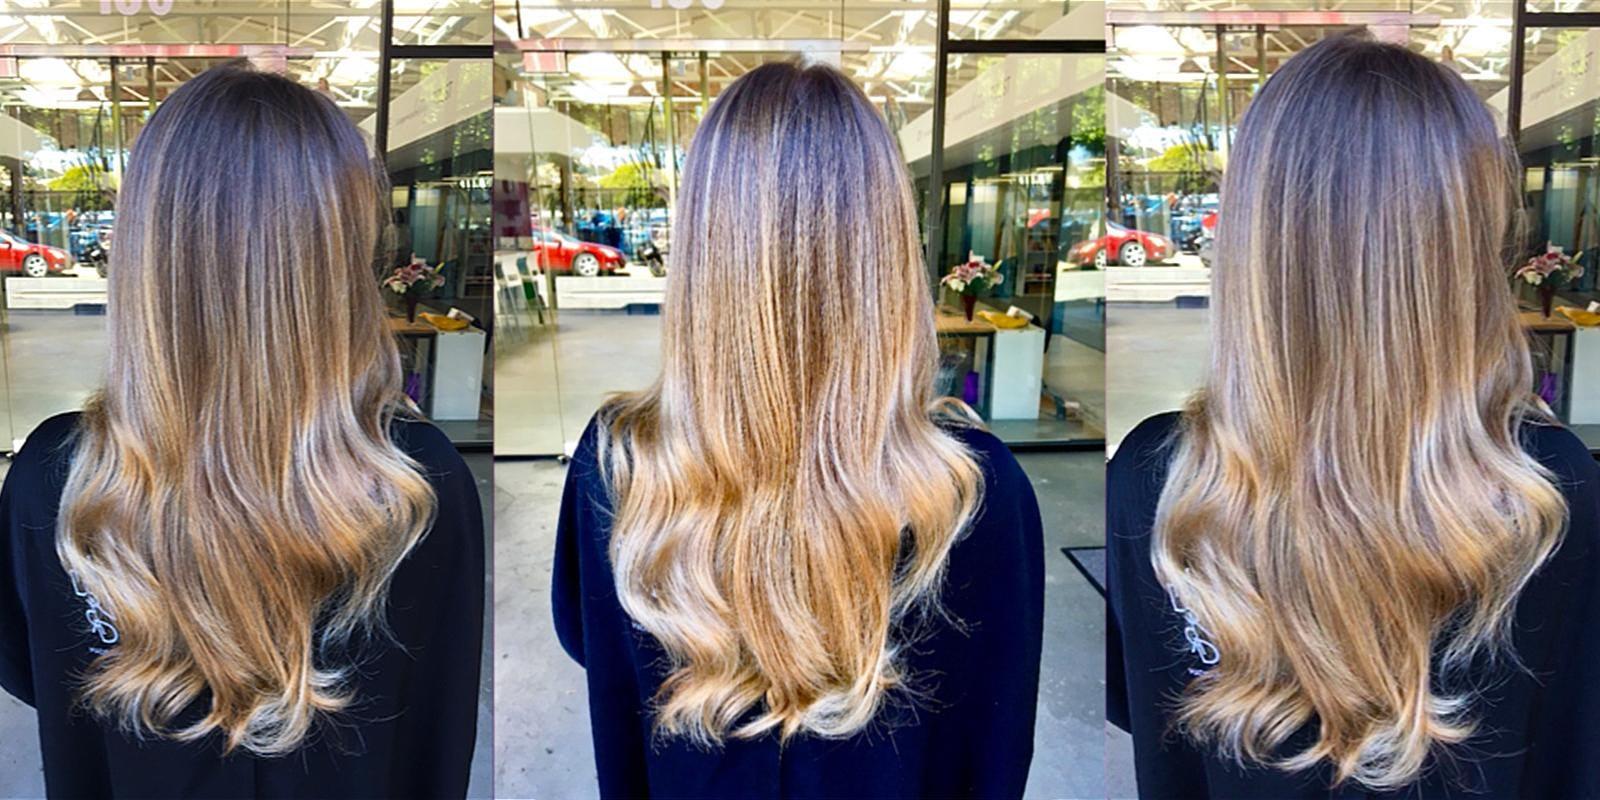 Balayage vs. Hair Foils the Great Highlight Debate